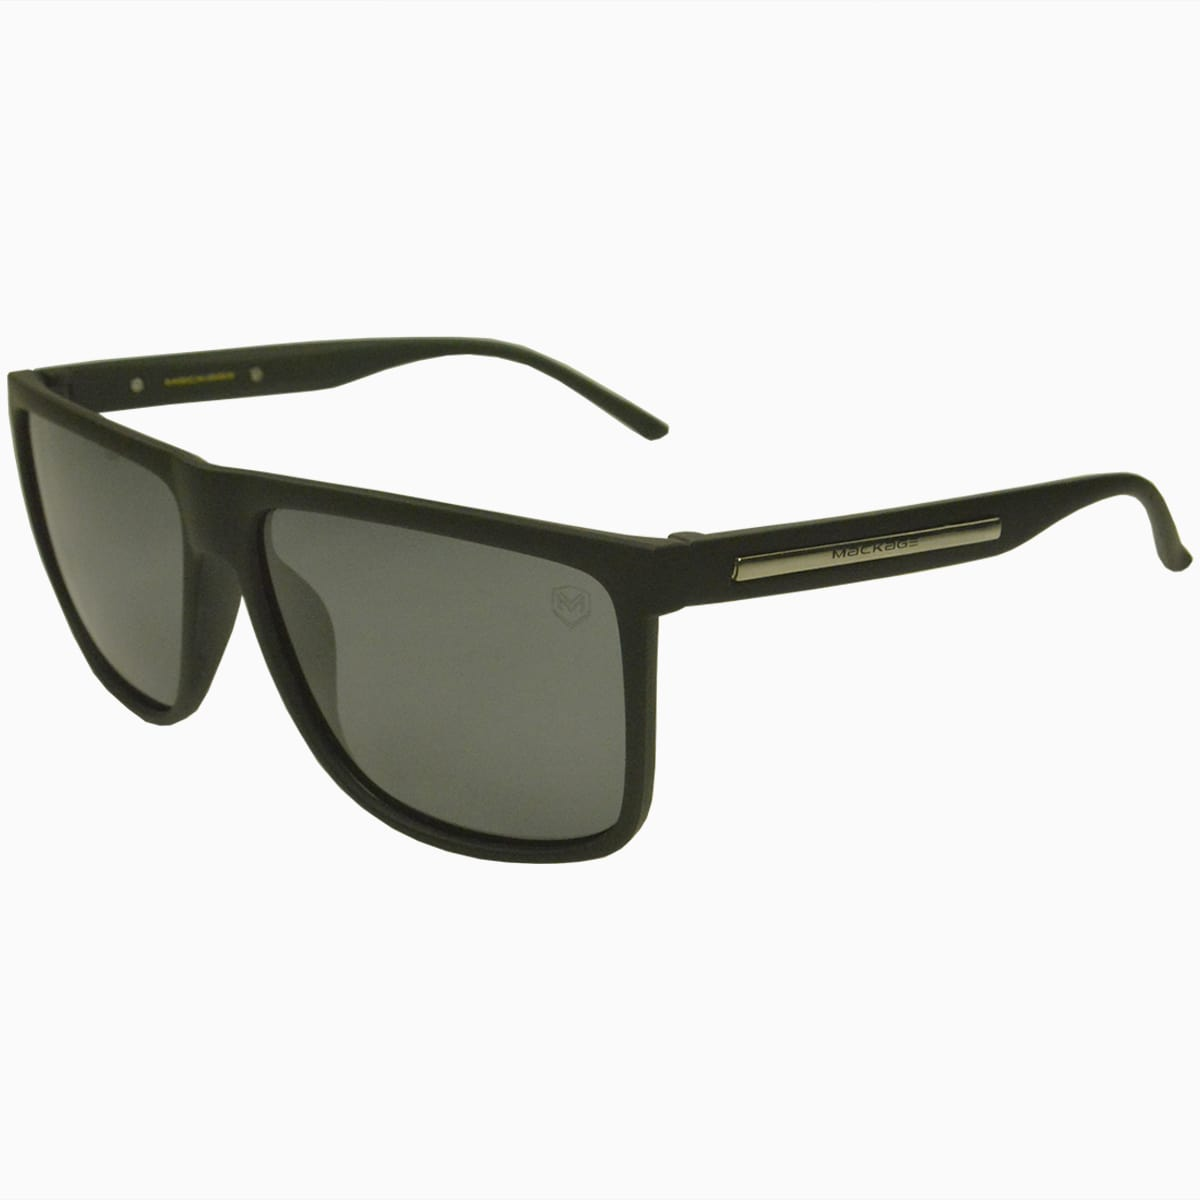 Óculos de Sol Mackage MK7717CLN Marrom Fosco e Preto Fosco